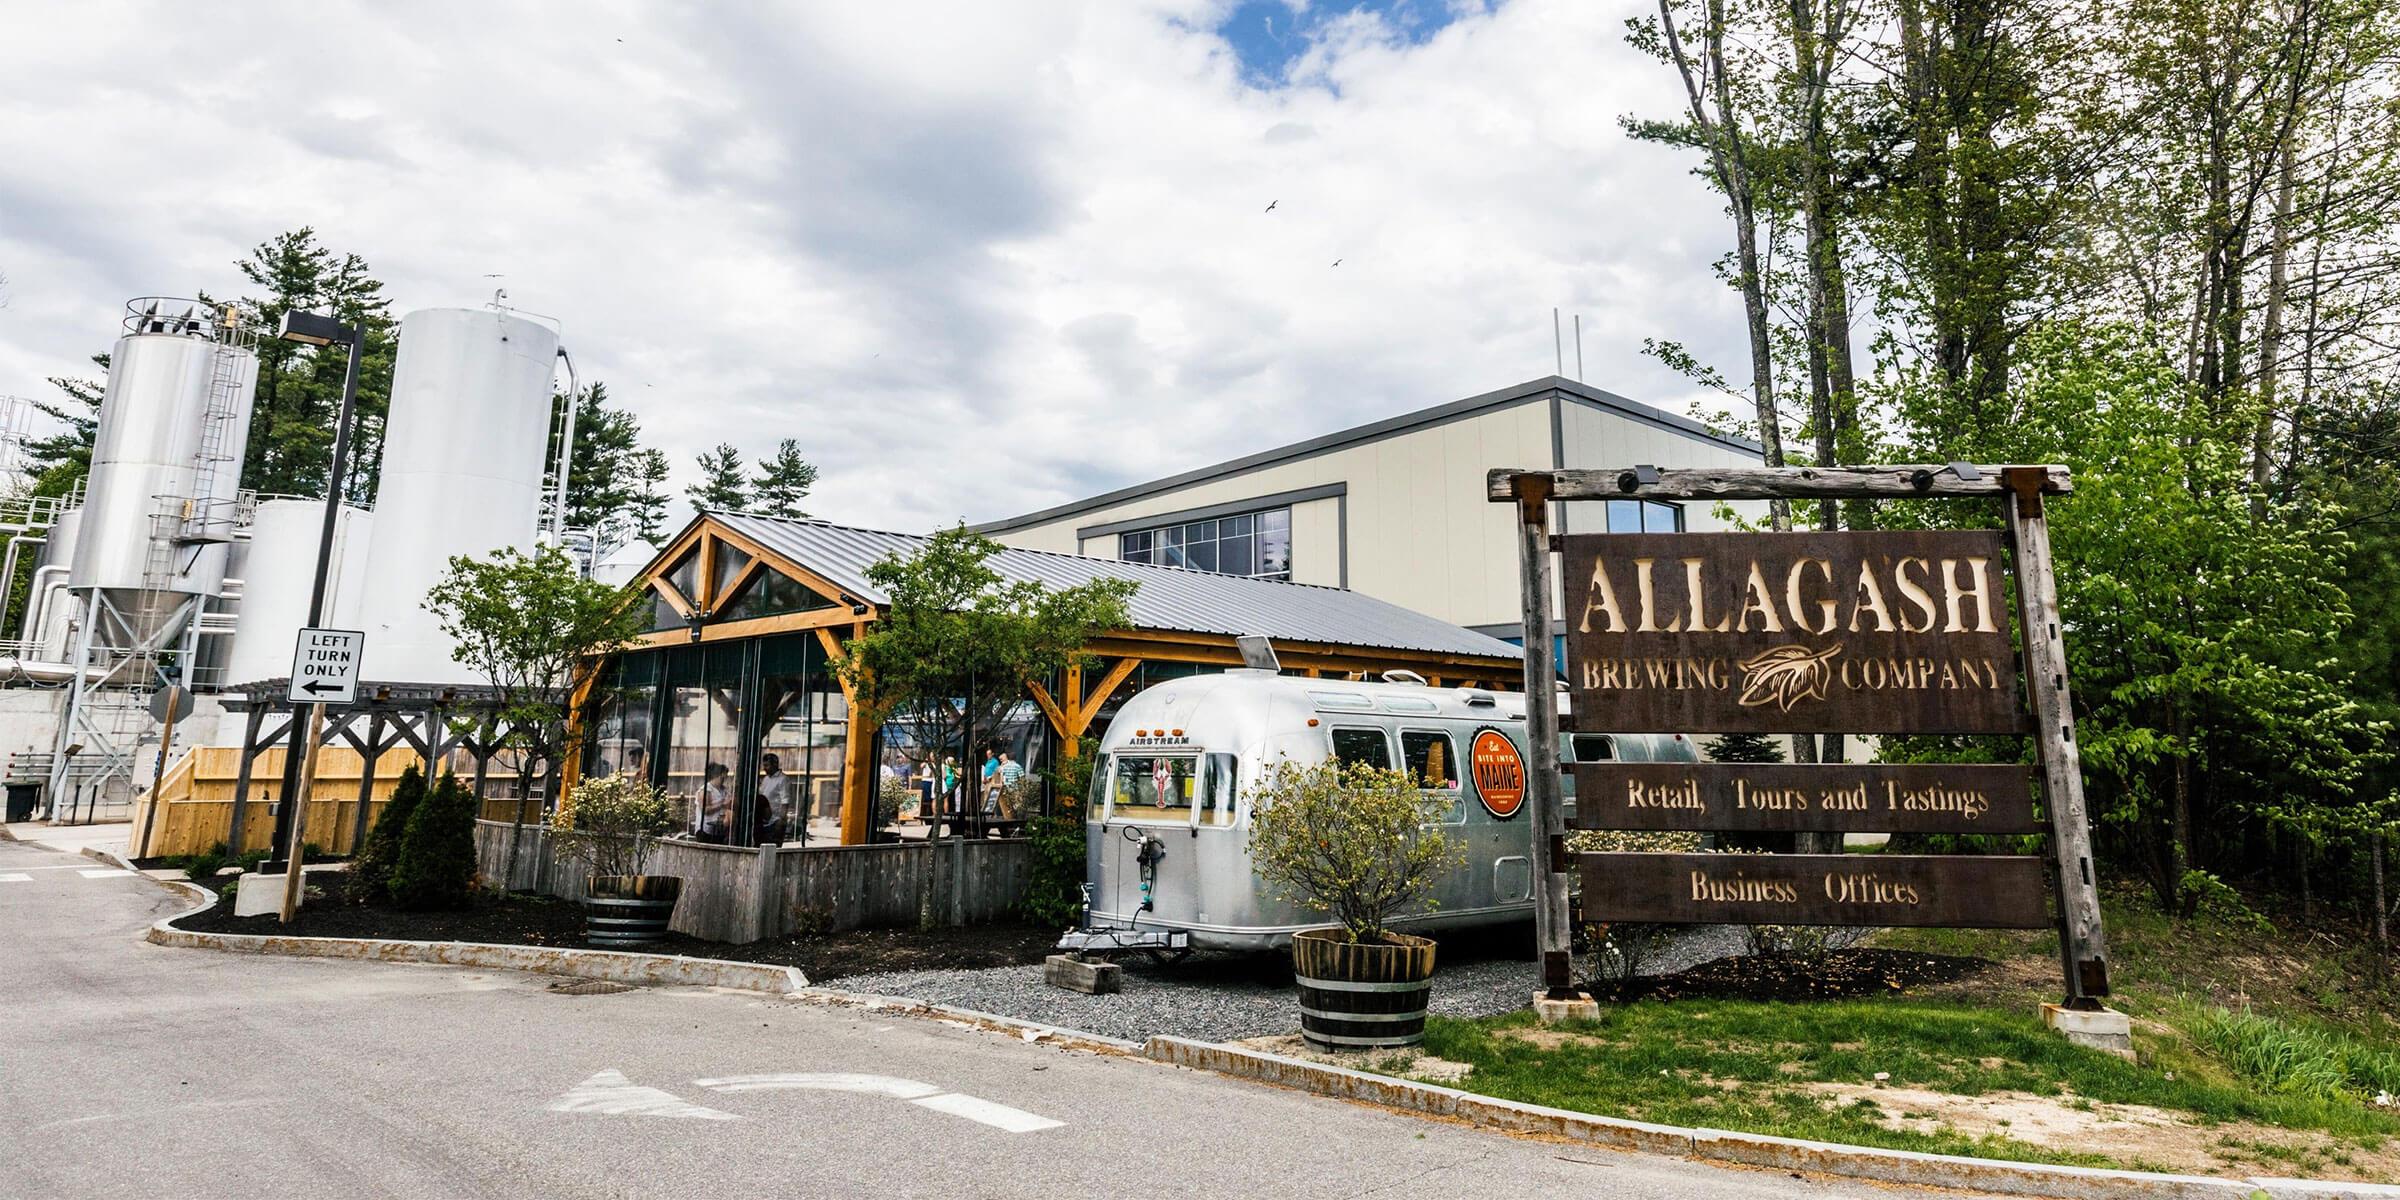 Outside Allagash Brewing Company in Portland, Maine